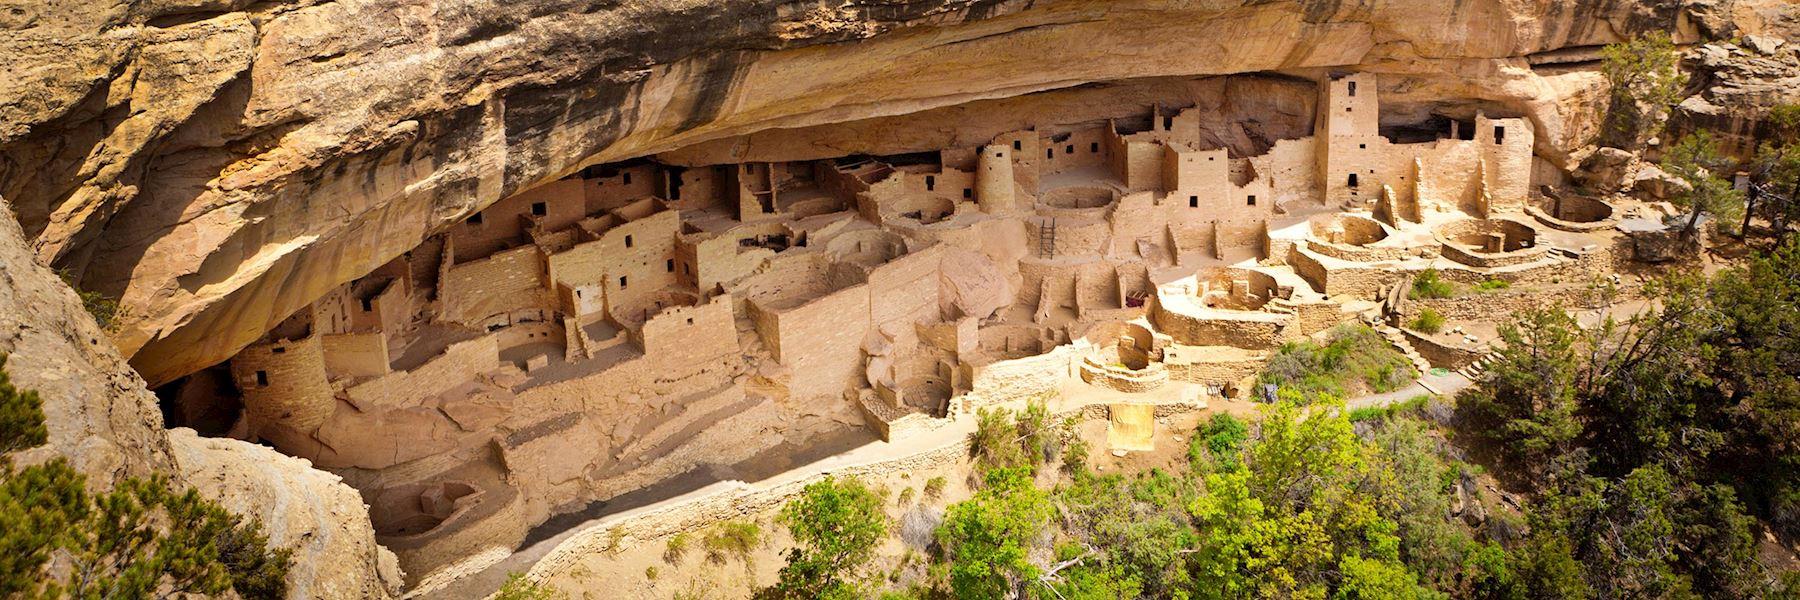 Visit Mesa Verde National Park, USA